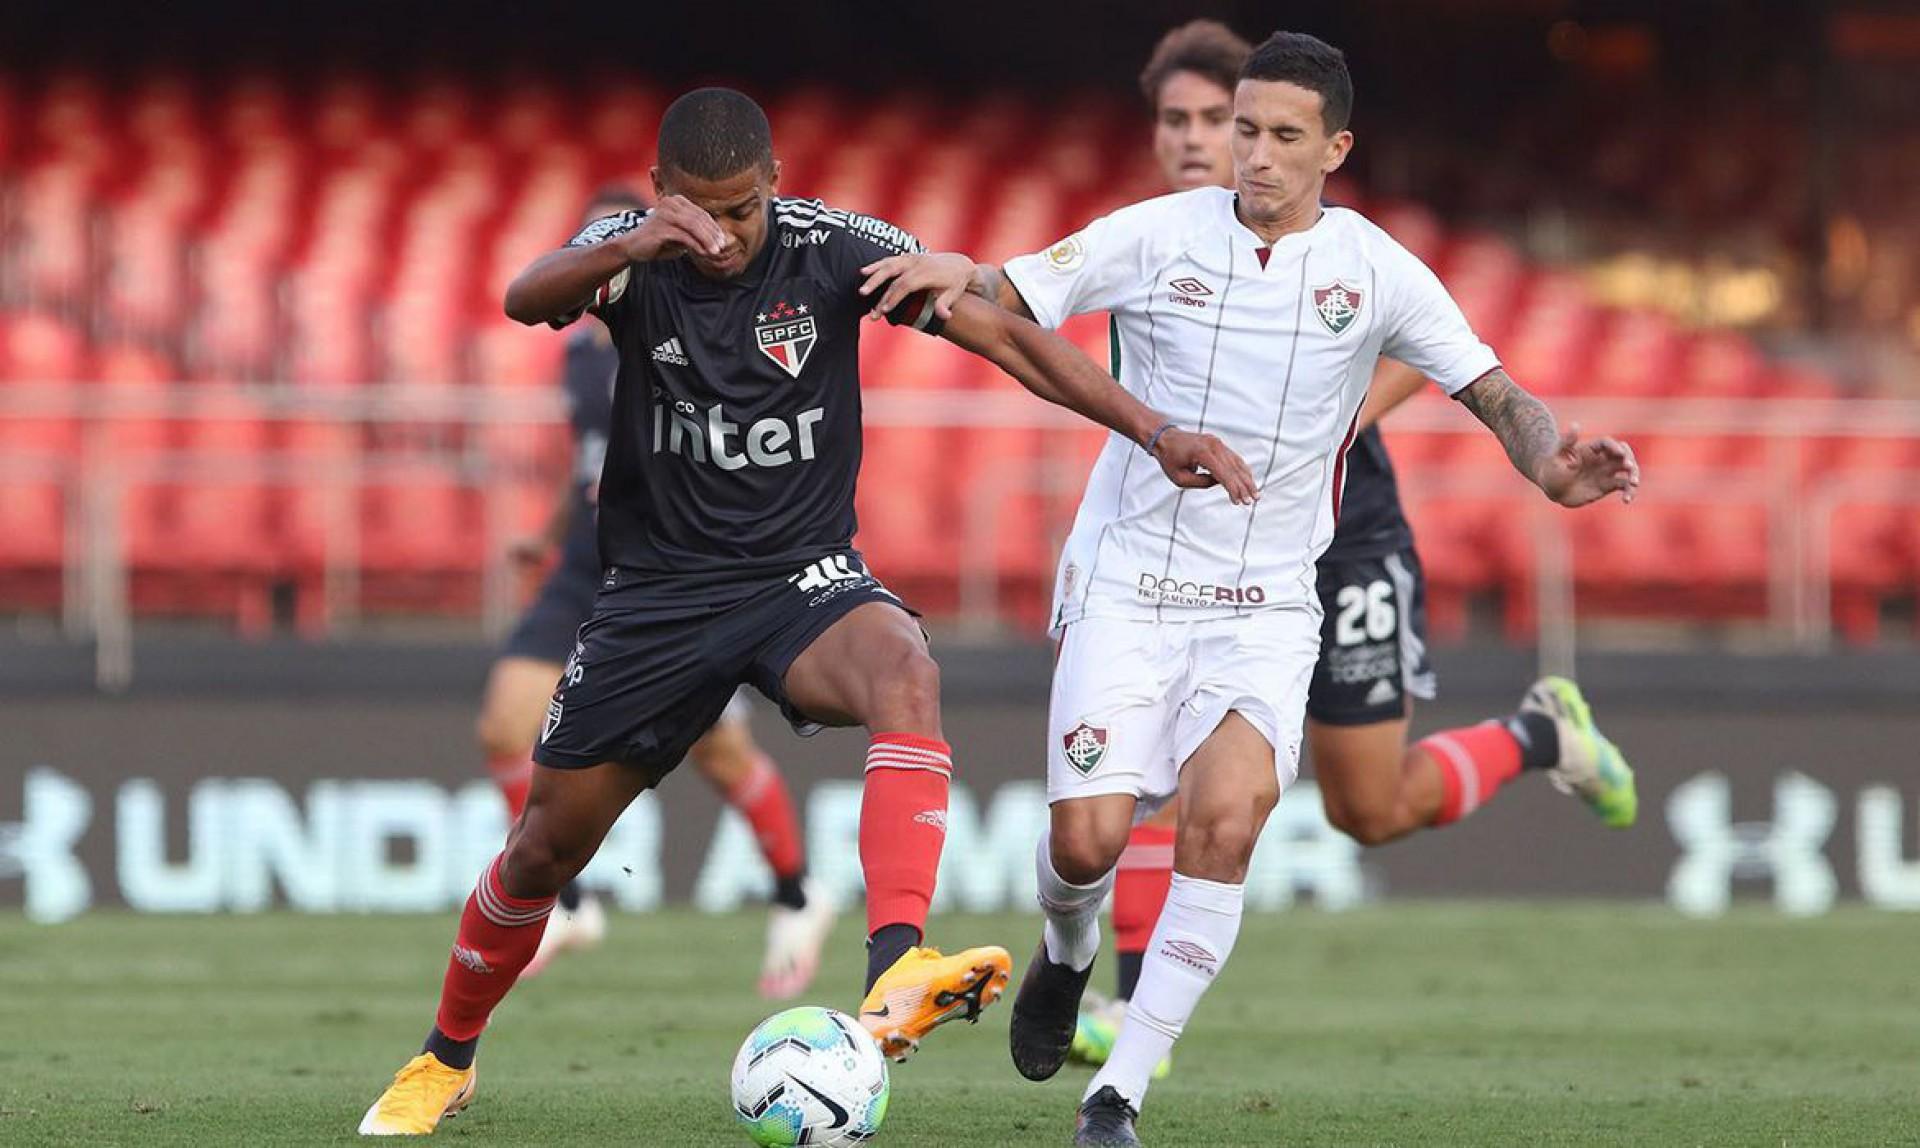 Sao Paulo X Fluminense Ao Vivo Onde Assistir Horario E Escalacao Futebol Esportes O Povo